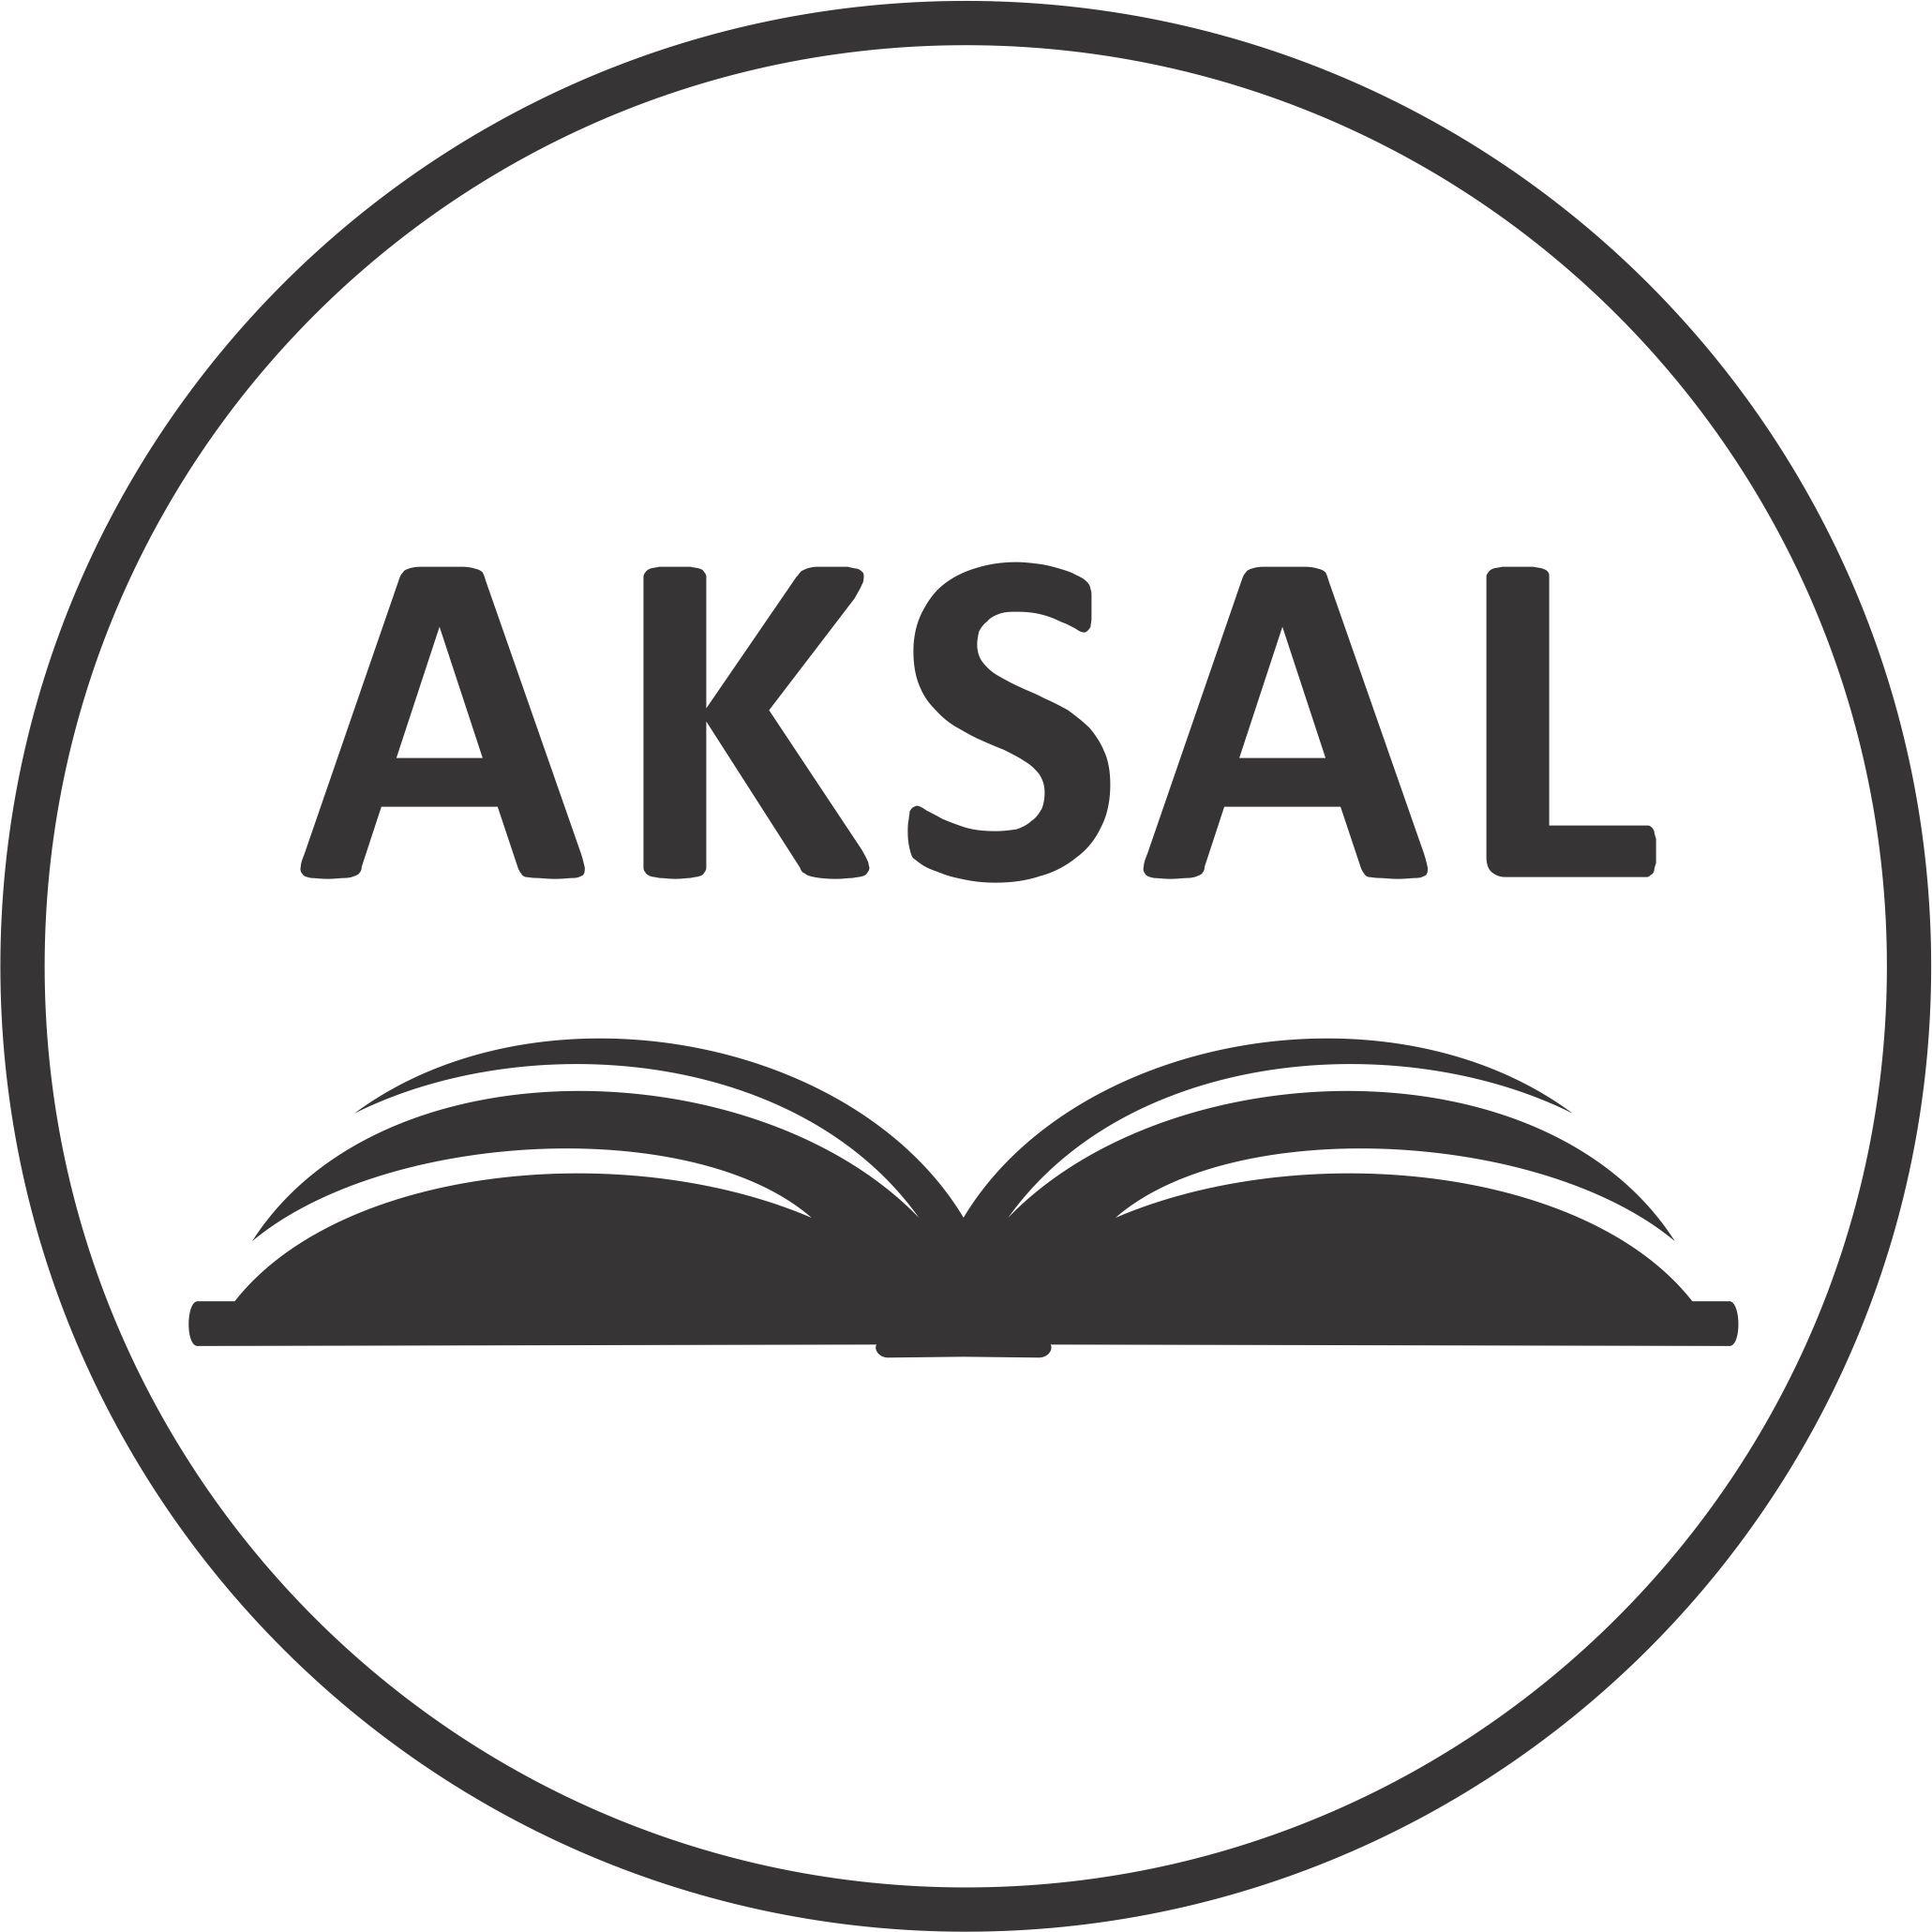 Aksal - LOGO